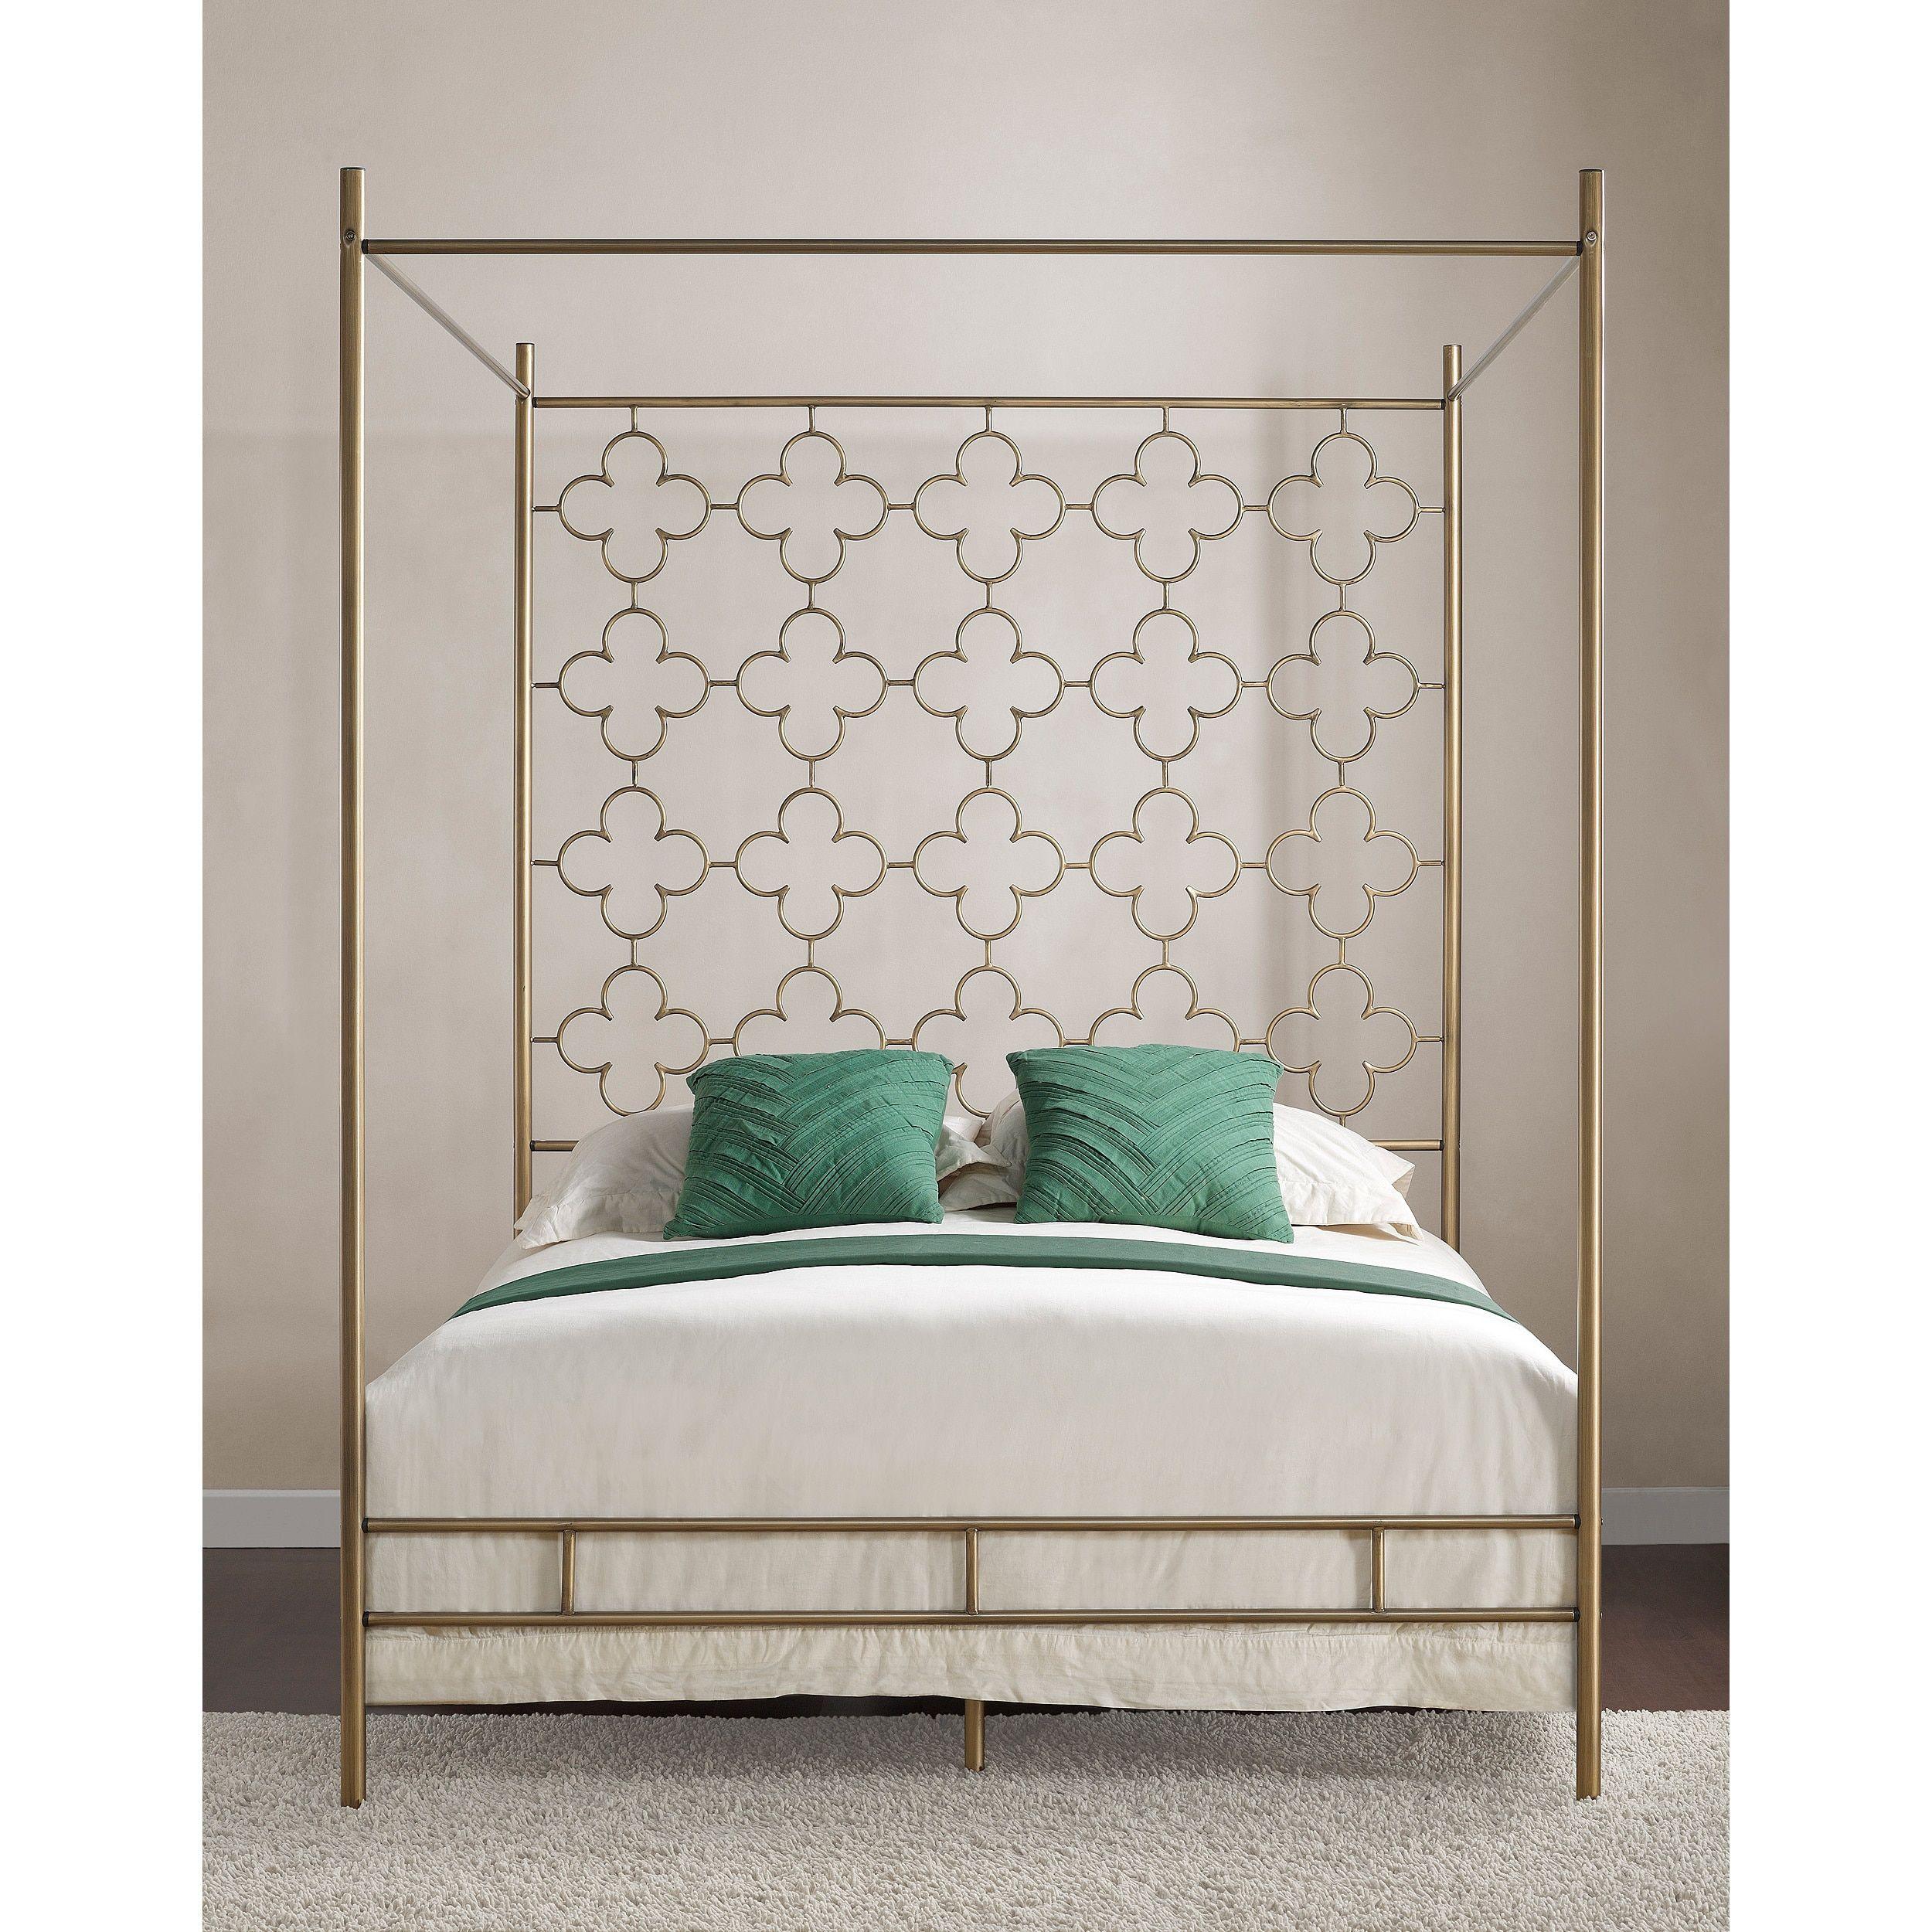 Retro Glitz Quatrefoil Queen Canopy Bed | Overstock.com Shopping - The Best Deals on  sc 1 st  Pinterest & Retro Glitz Quatrefoil Queen Canopy Bed | Overstock.com Shopping ...